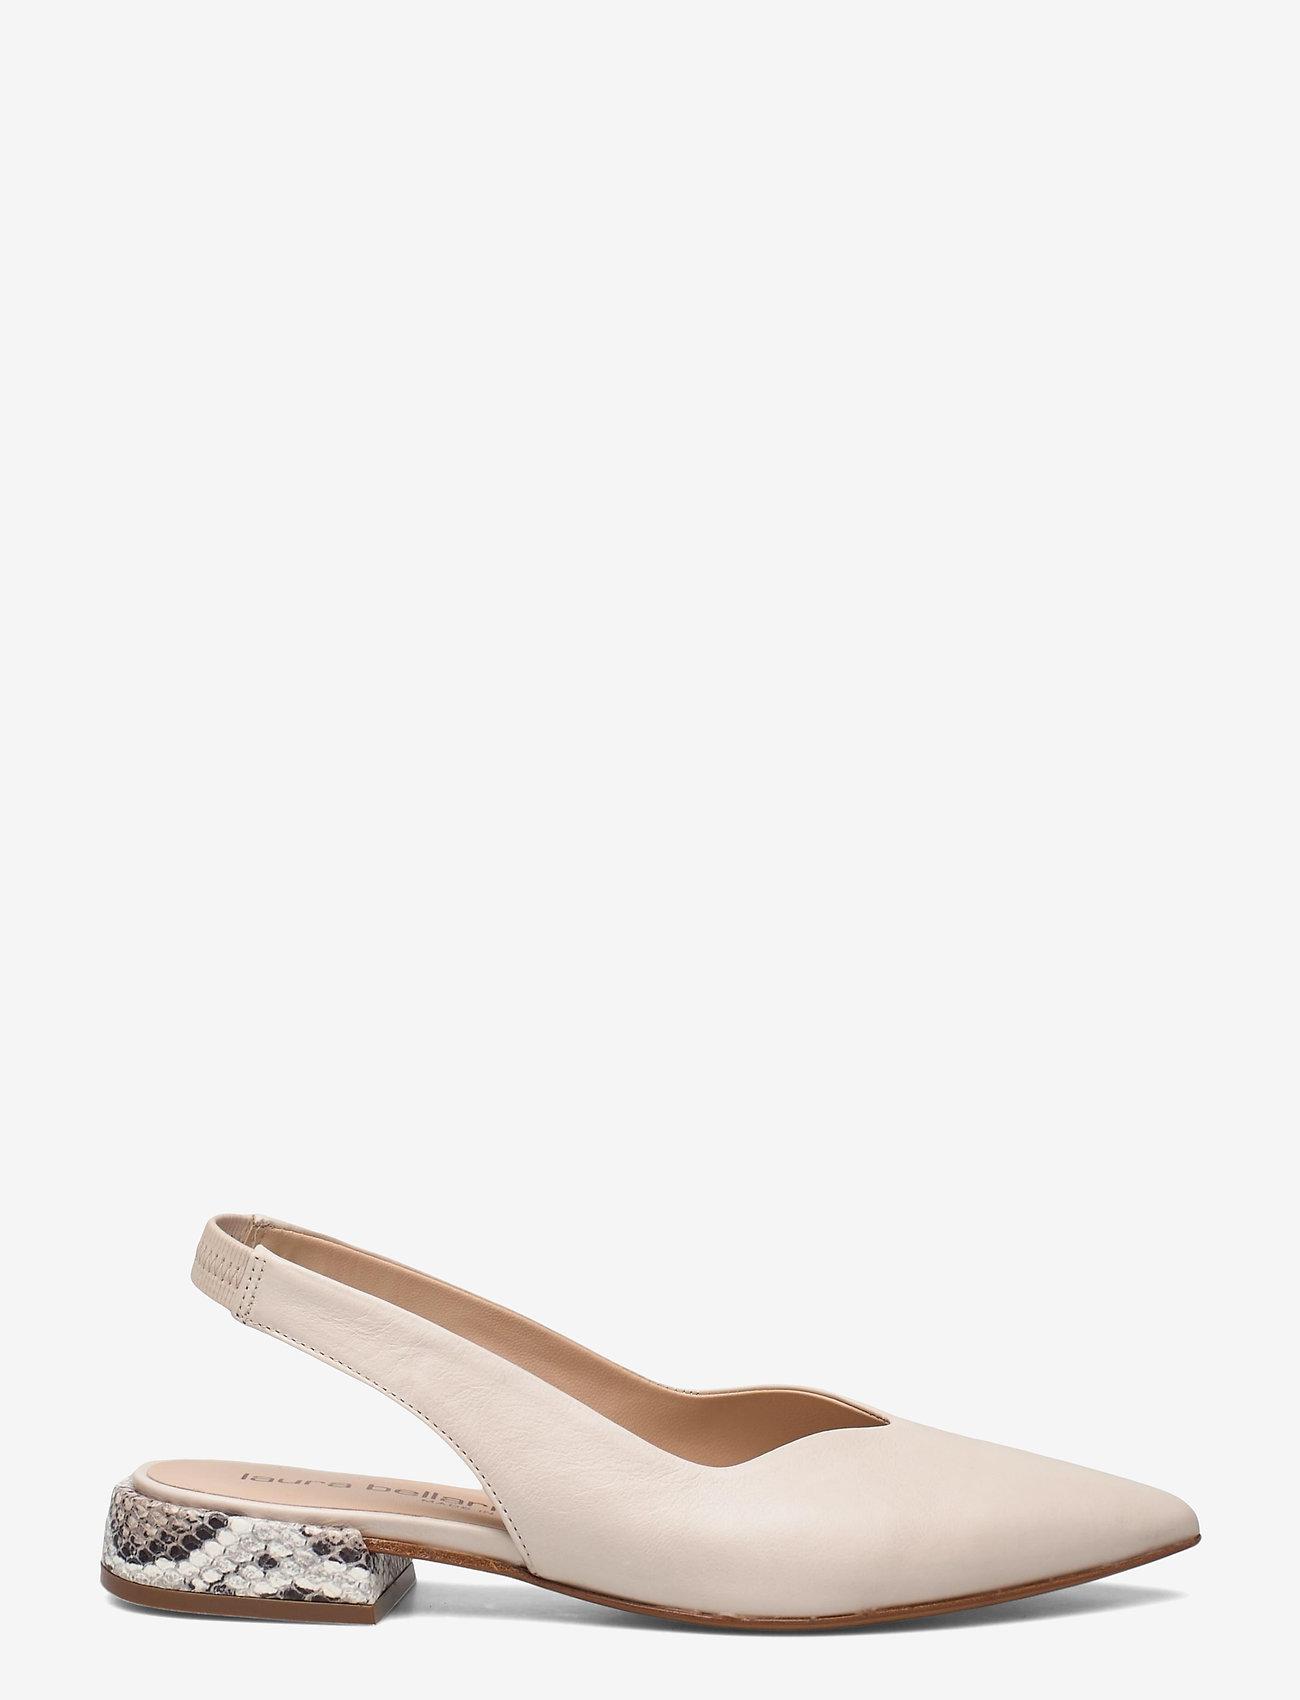 Laura Bellariva - Flats - ballerinas - ecru/beige - 1